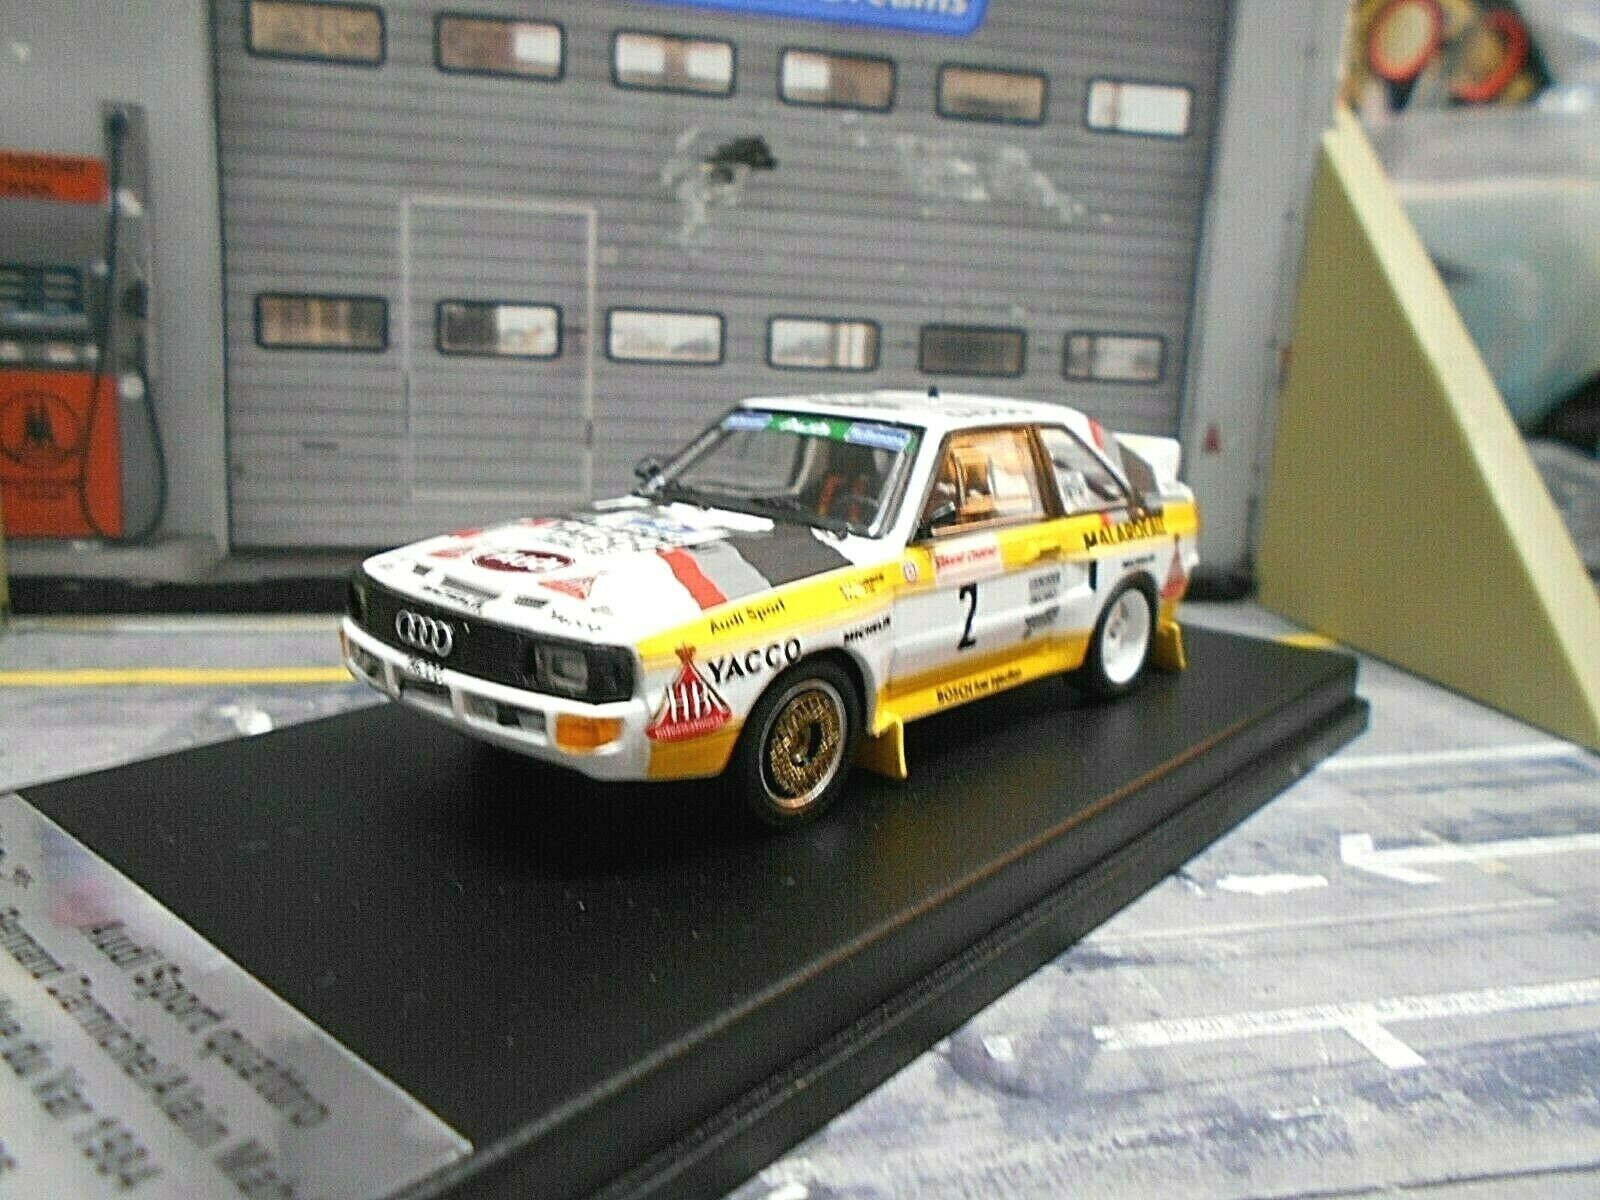 AUDI Sport Quattro S1 Rallye du Var 1984  2 Darniche Yacco H B Trofeu Sc 1 43